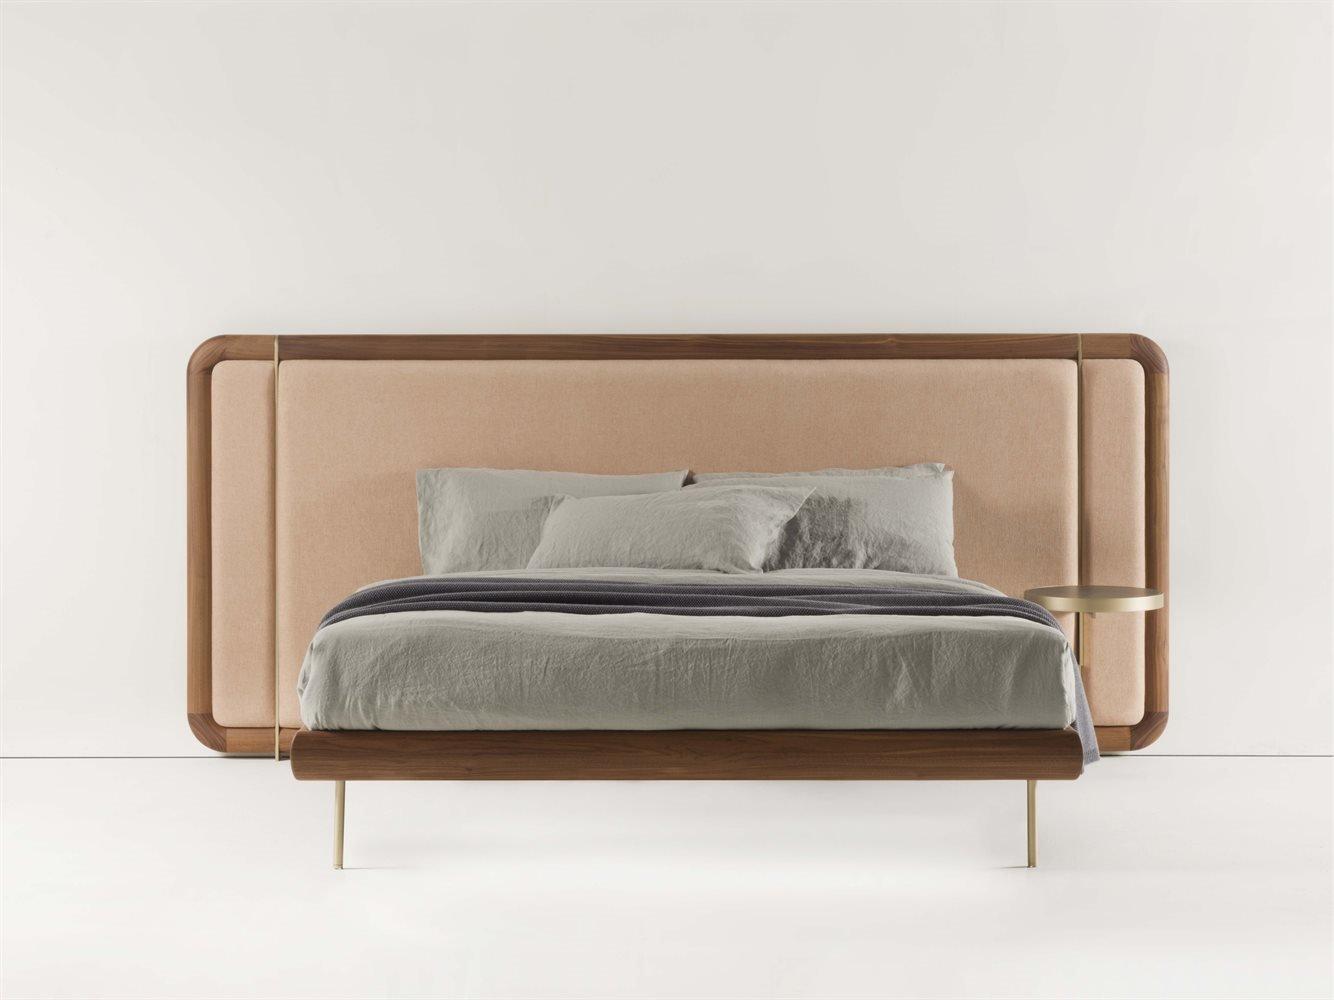 Killian Bed from Porada, designed by M. Marconato and T. Zappa